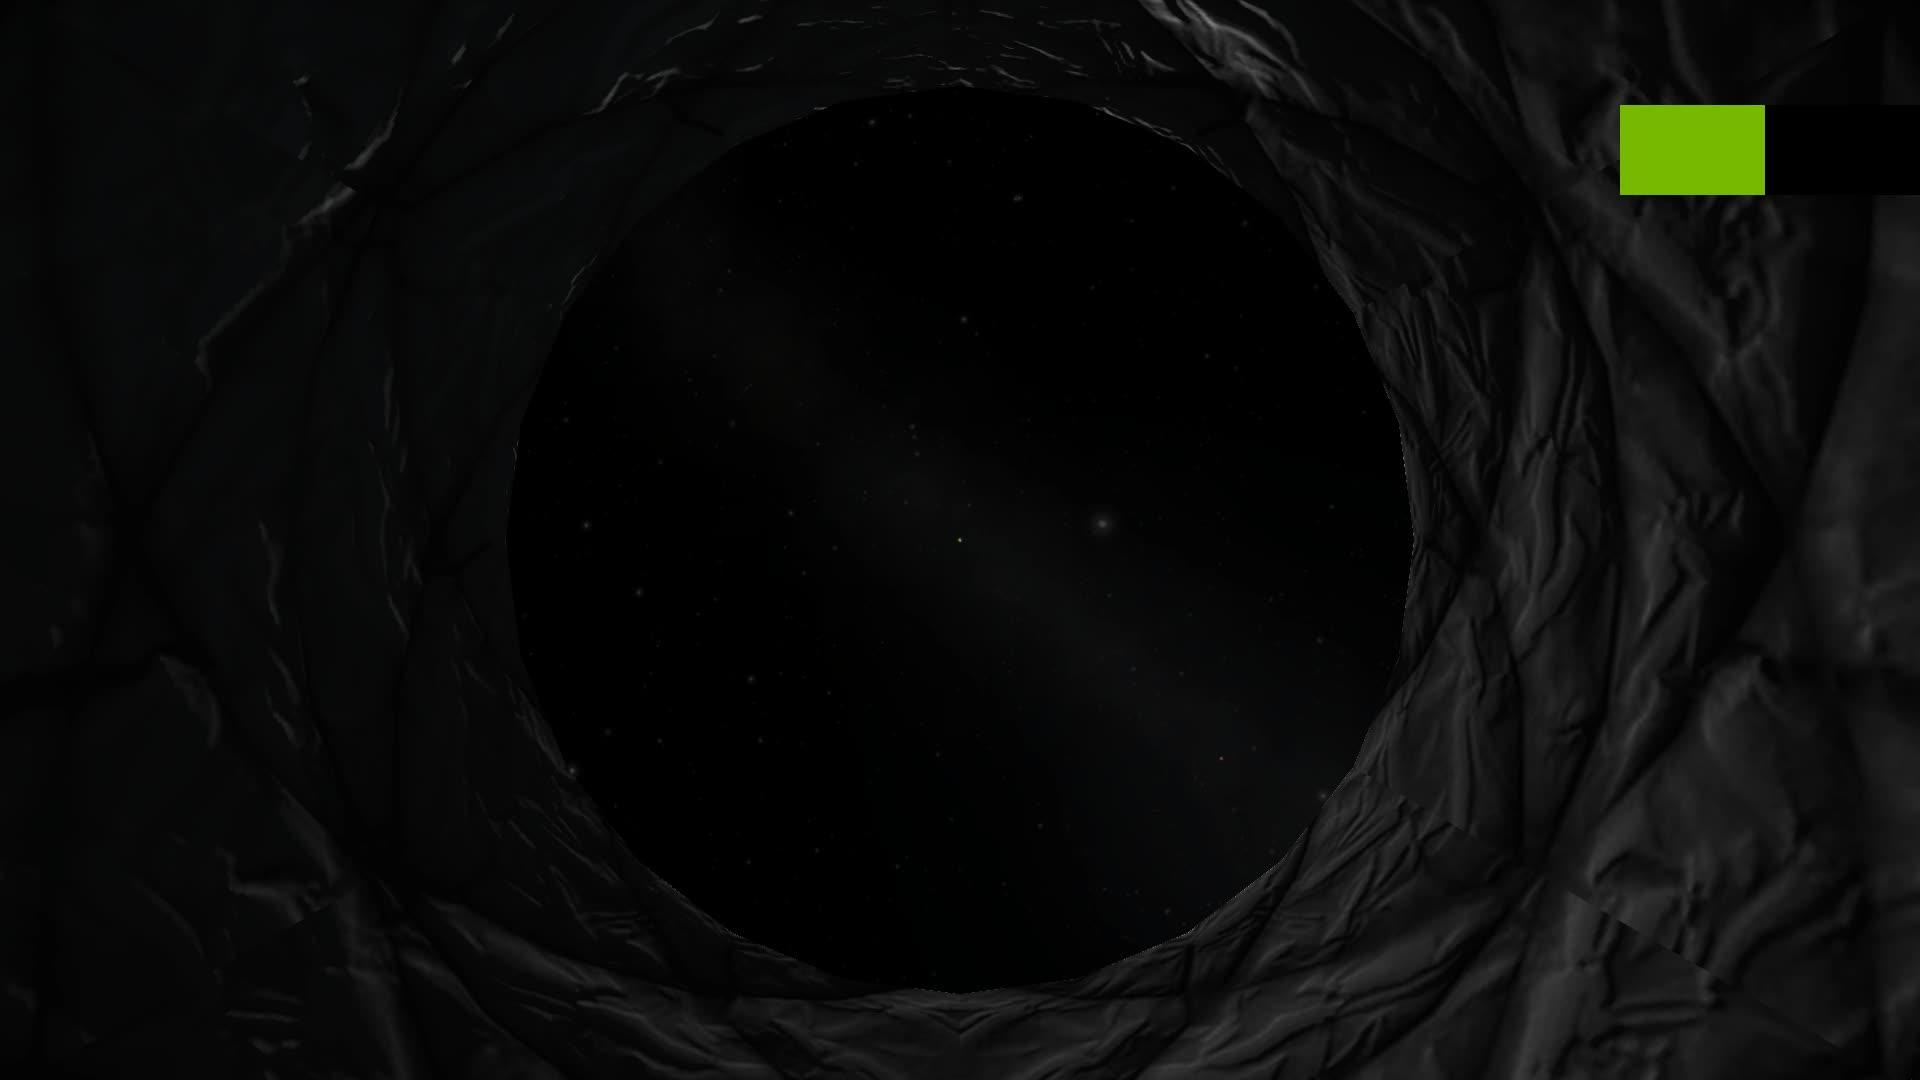 Kerbal Space Program 2018.04.19 - 18.31.57.02 GIFs